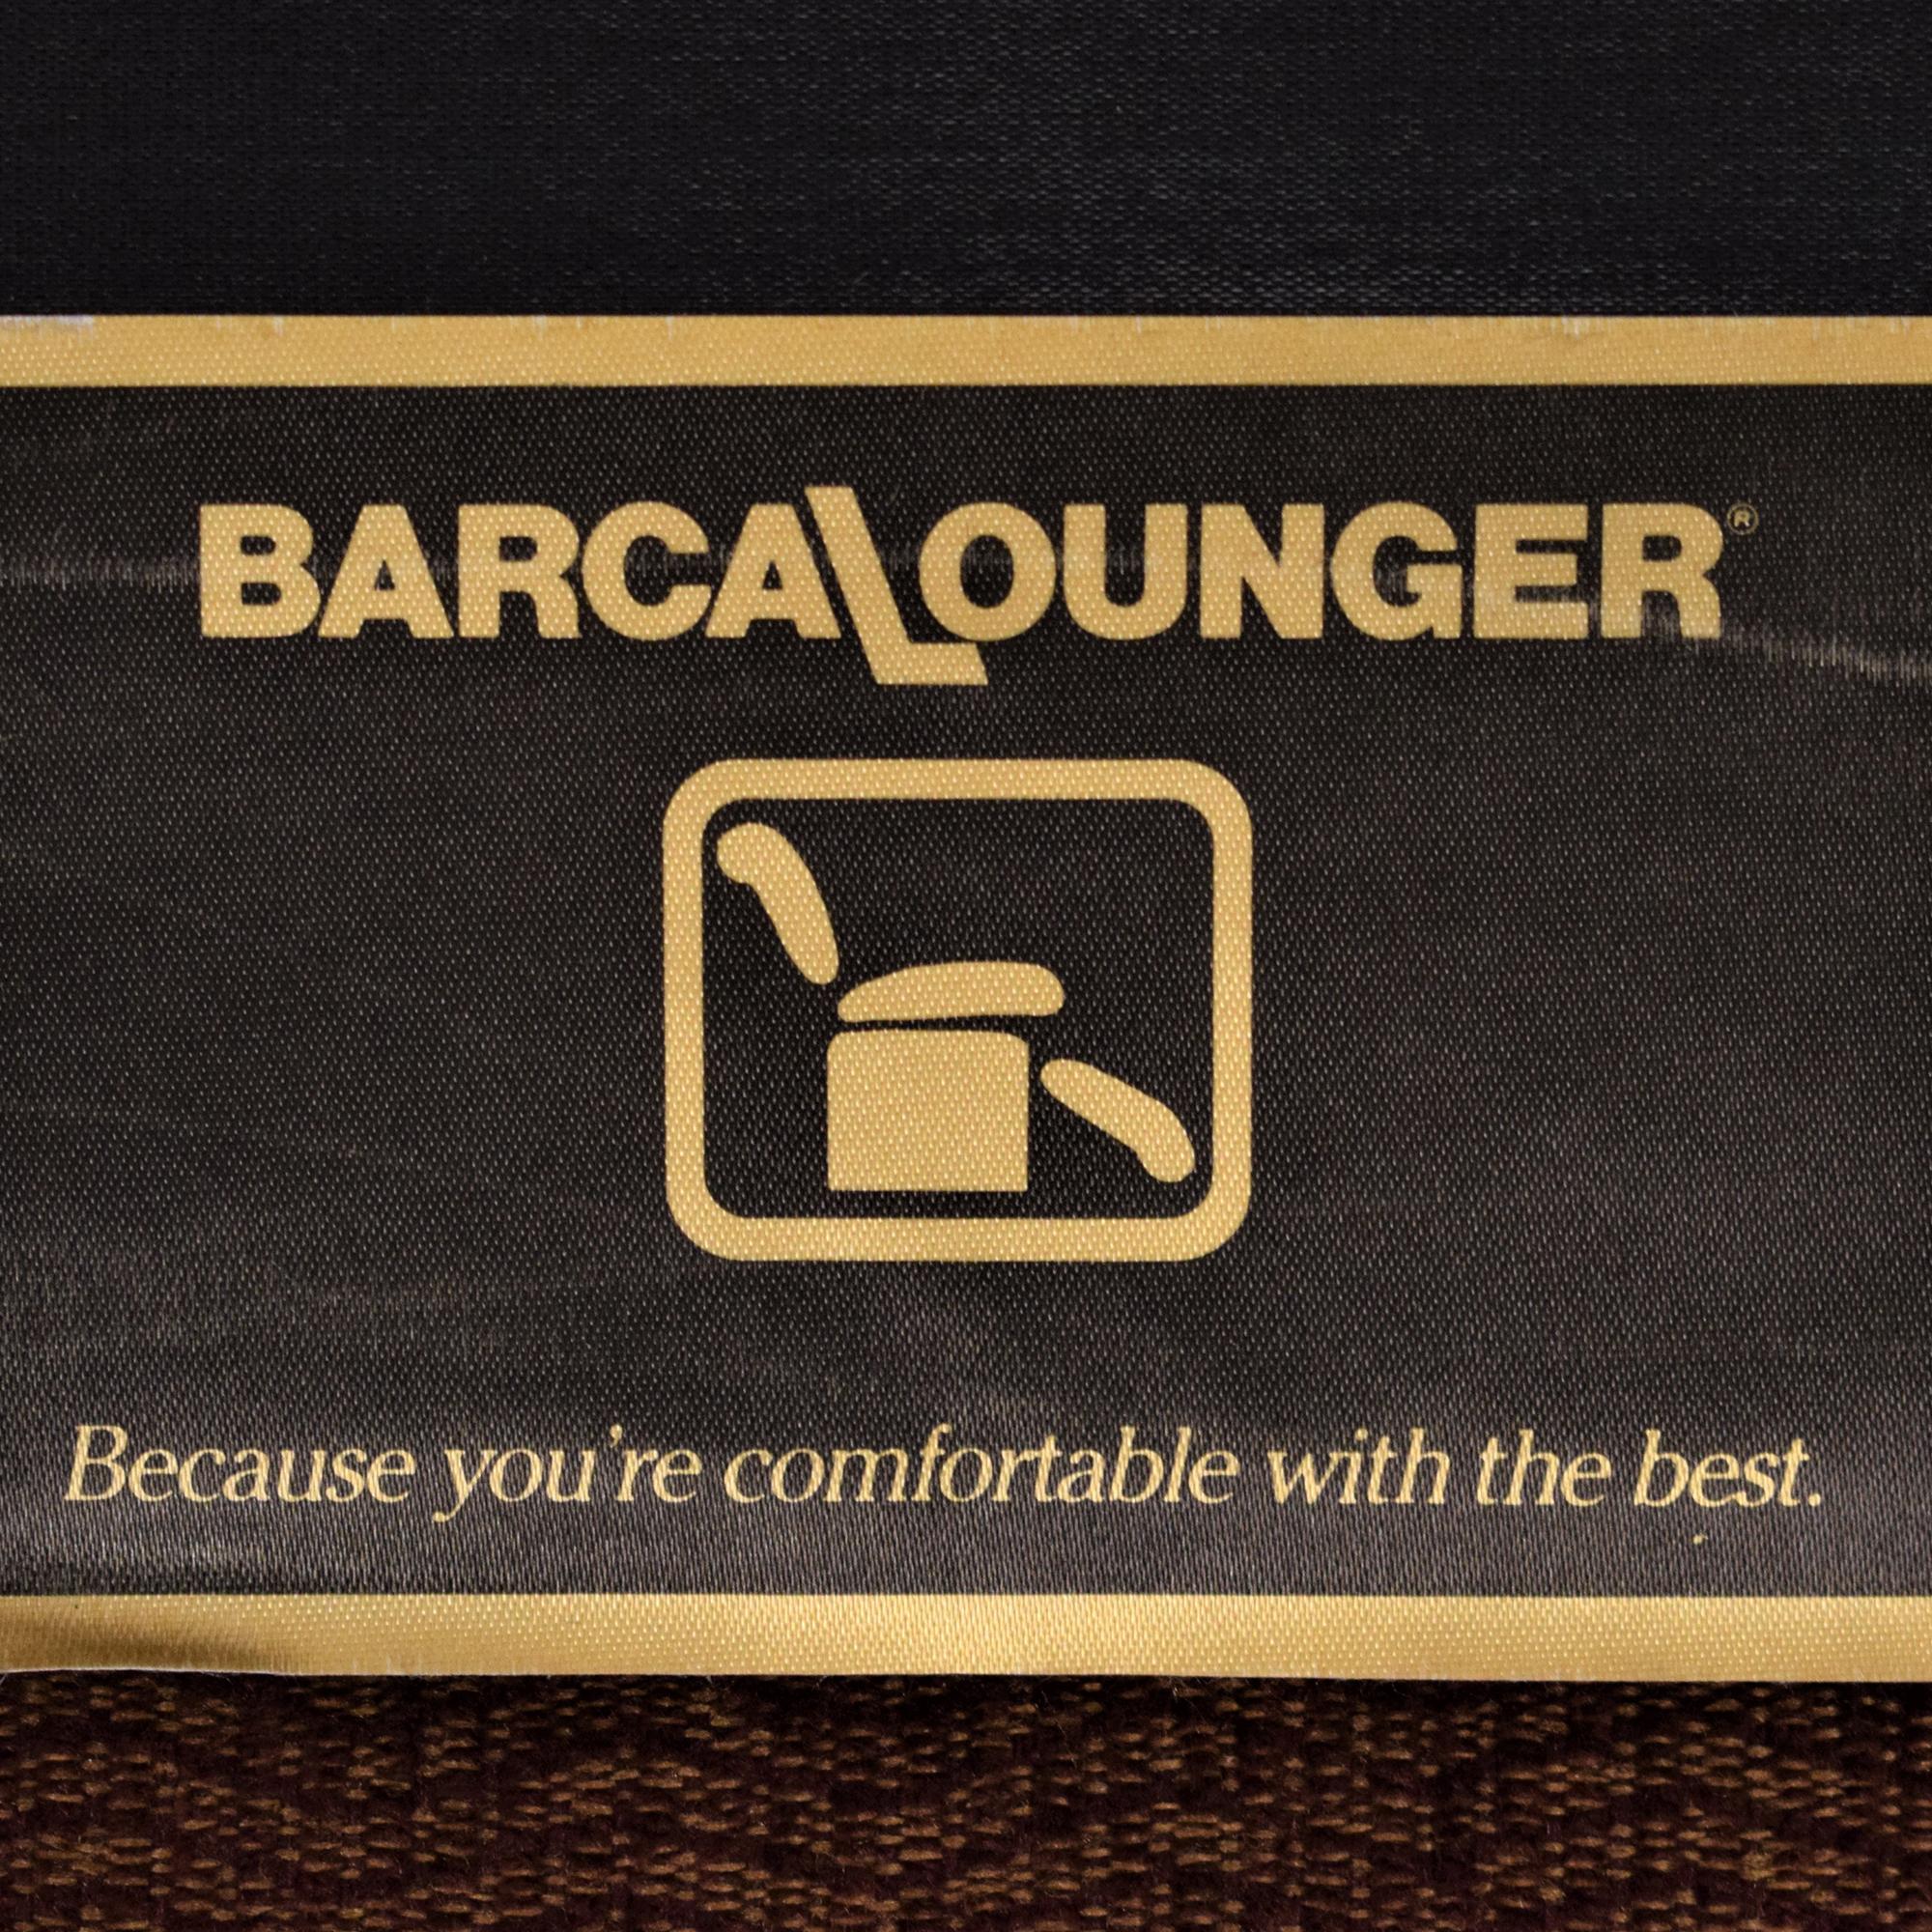 shop Barcalounger Petite Recliner Barcalounger Recliners